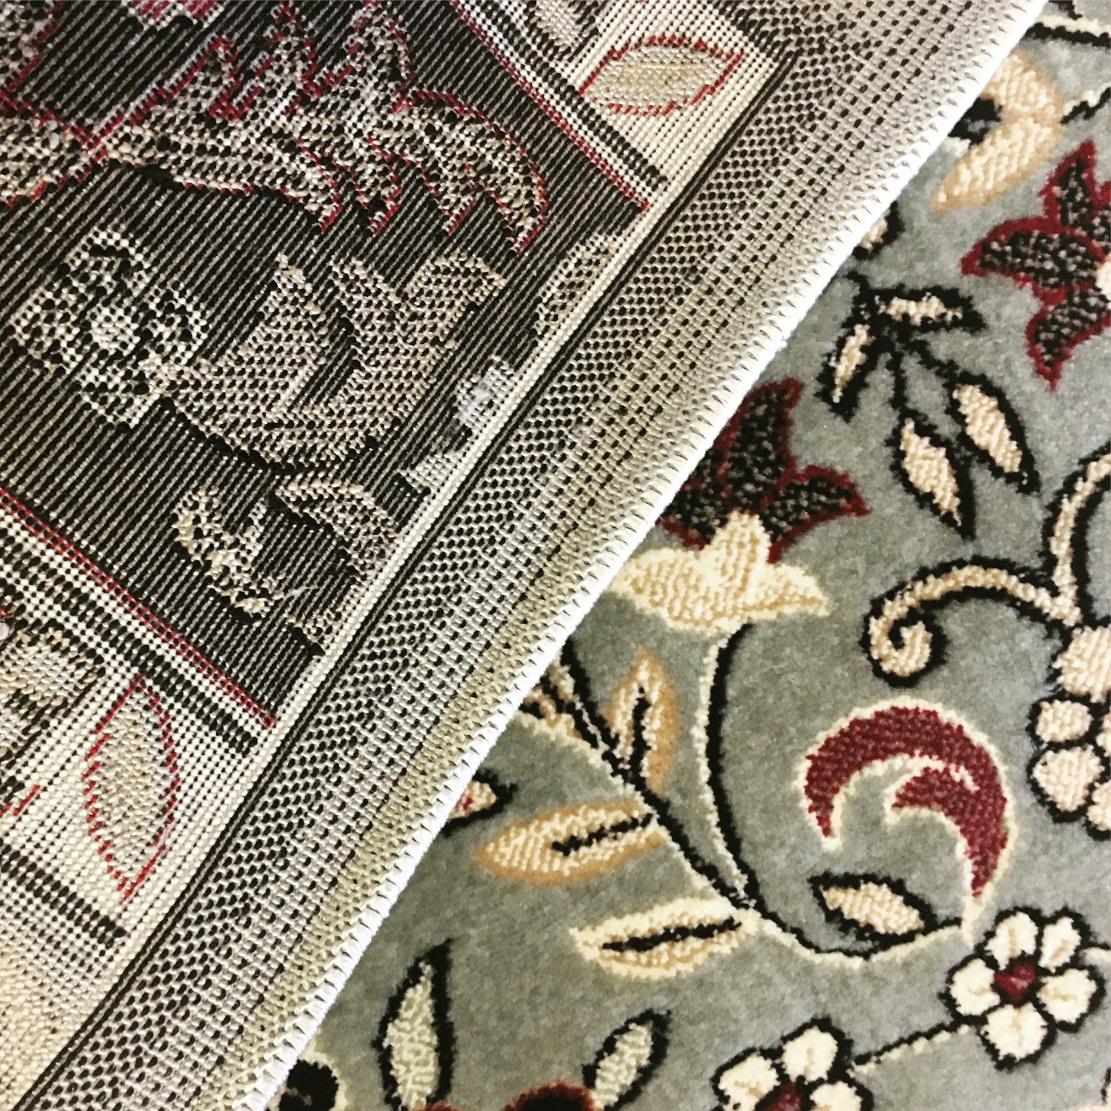 Green Authentic Haramain Rawdah Prayer Mat Rug Carpet